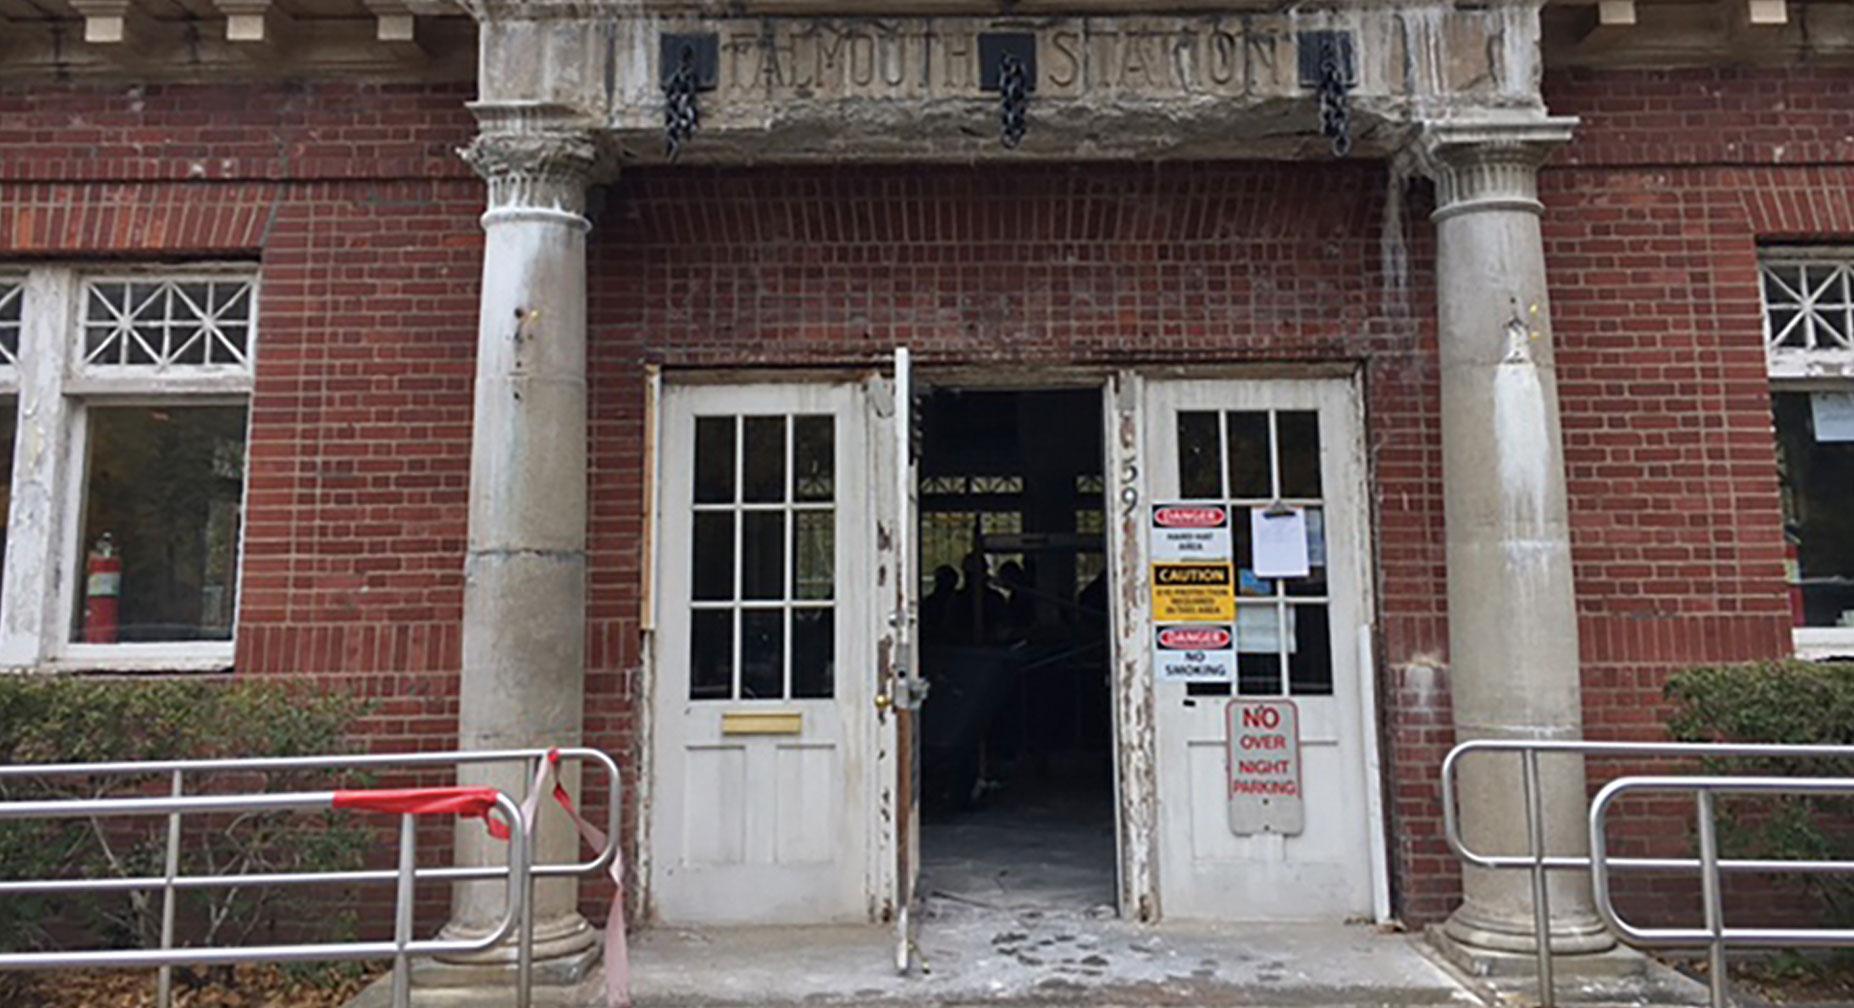 Falmouth-Station-12.jpg